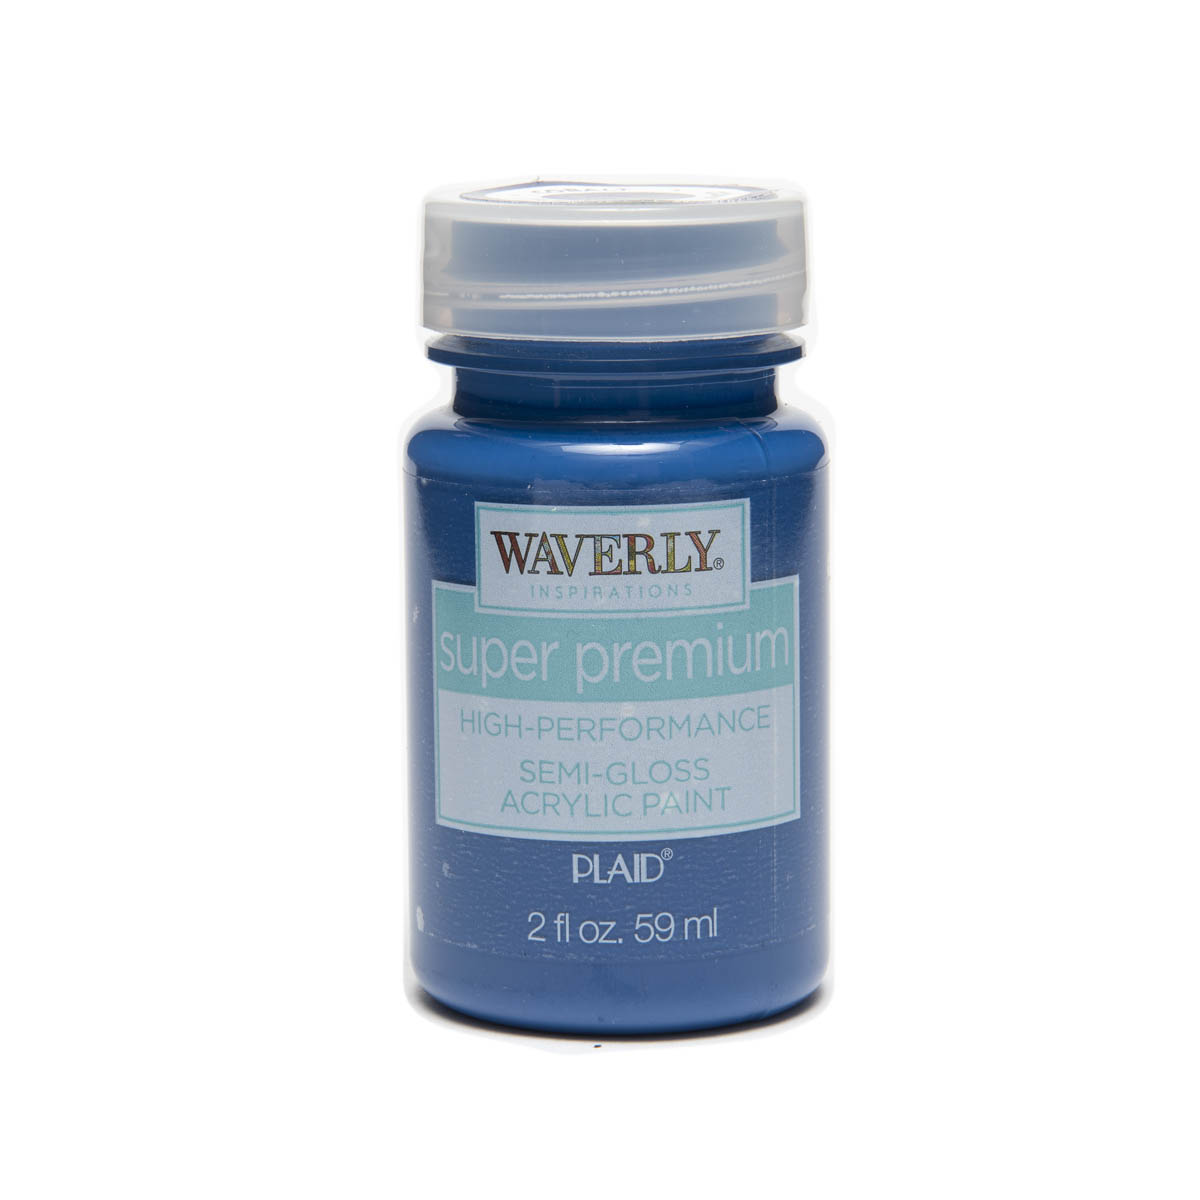 Waverly ® Inspirations Super Premium Semi-Gloss Acrylic Paint - Cobalt Hue, 2 oz.